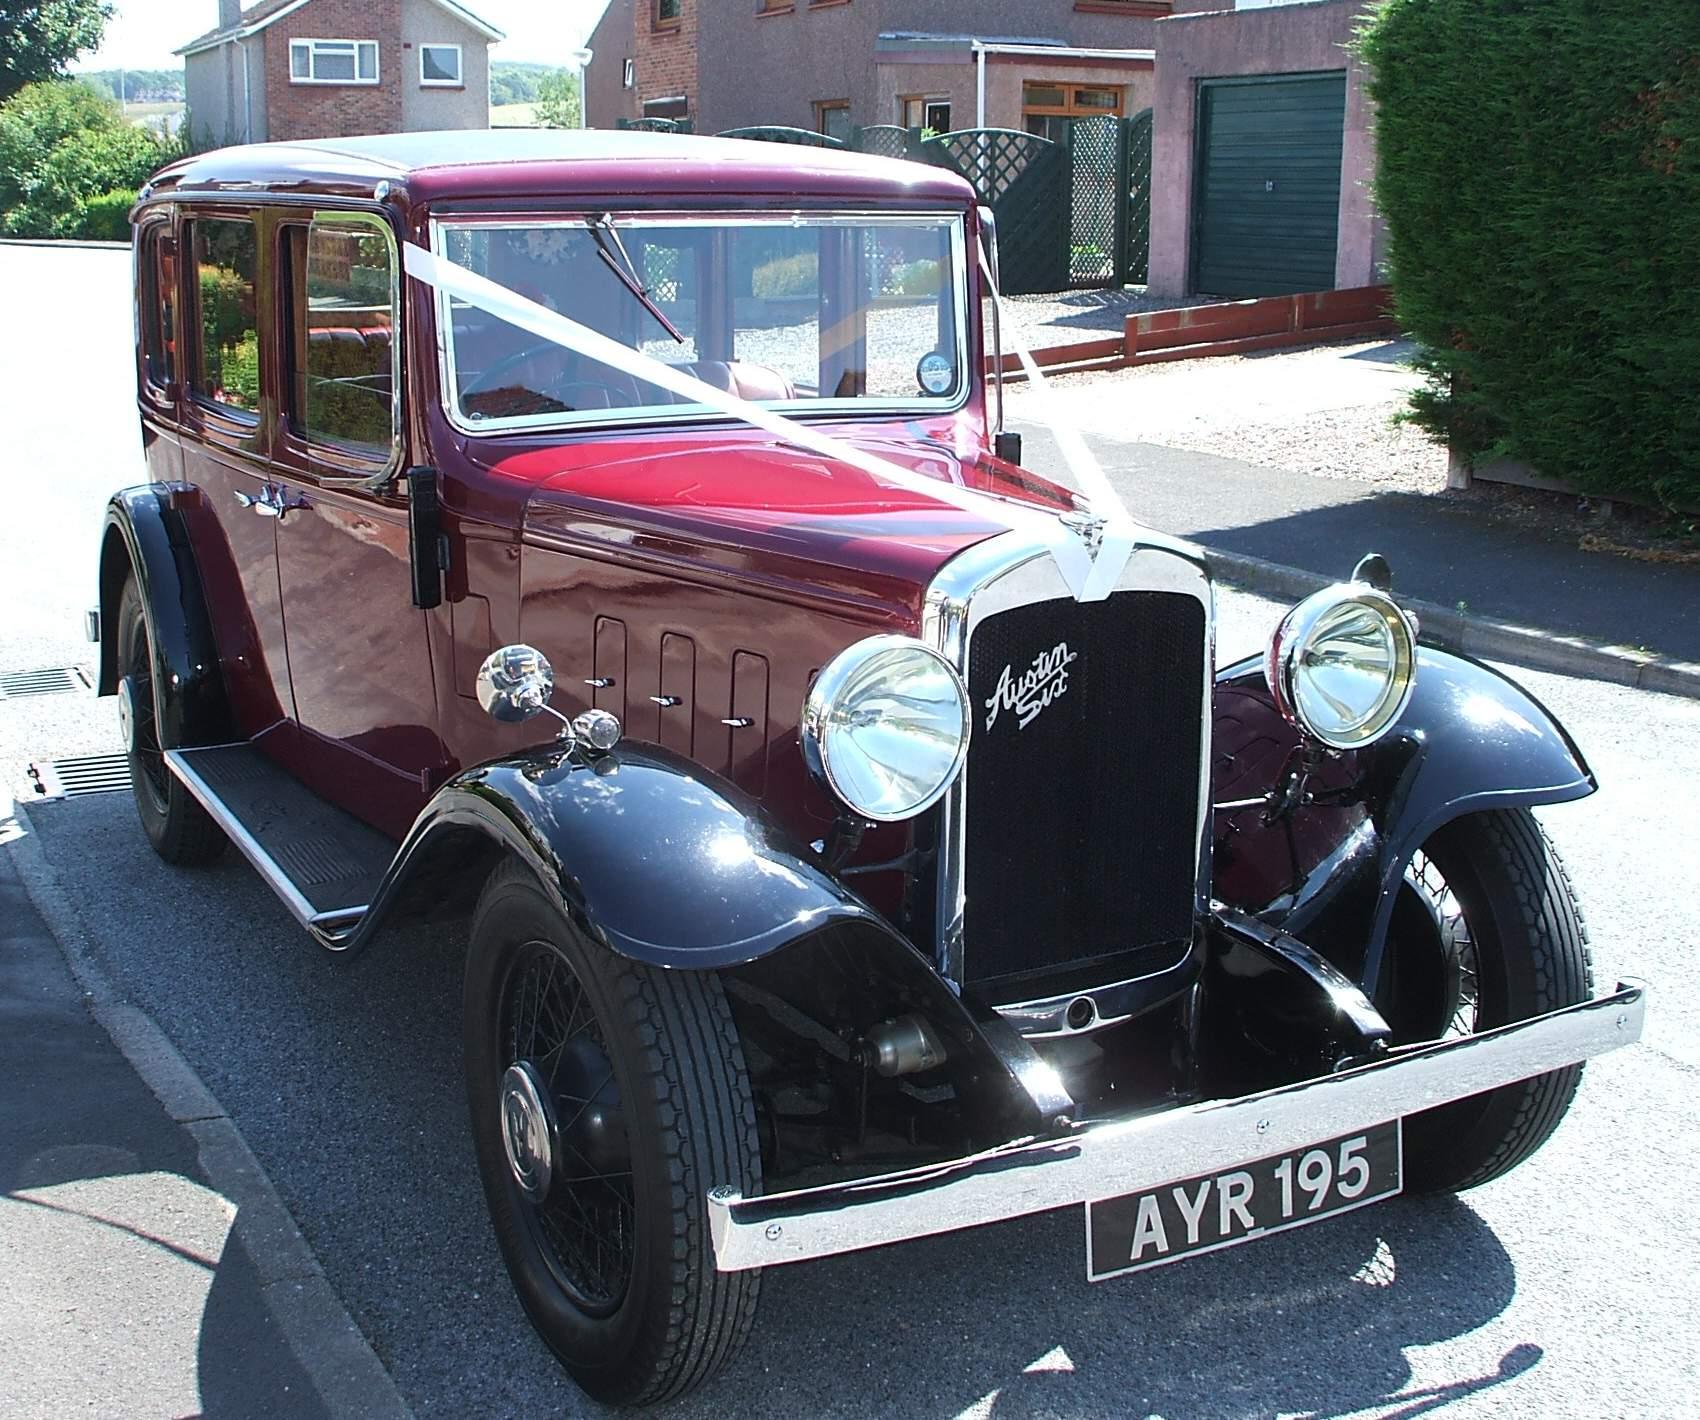 File:Wedding vintage car.jpg - Wikimedia Commons